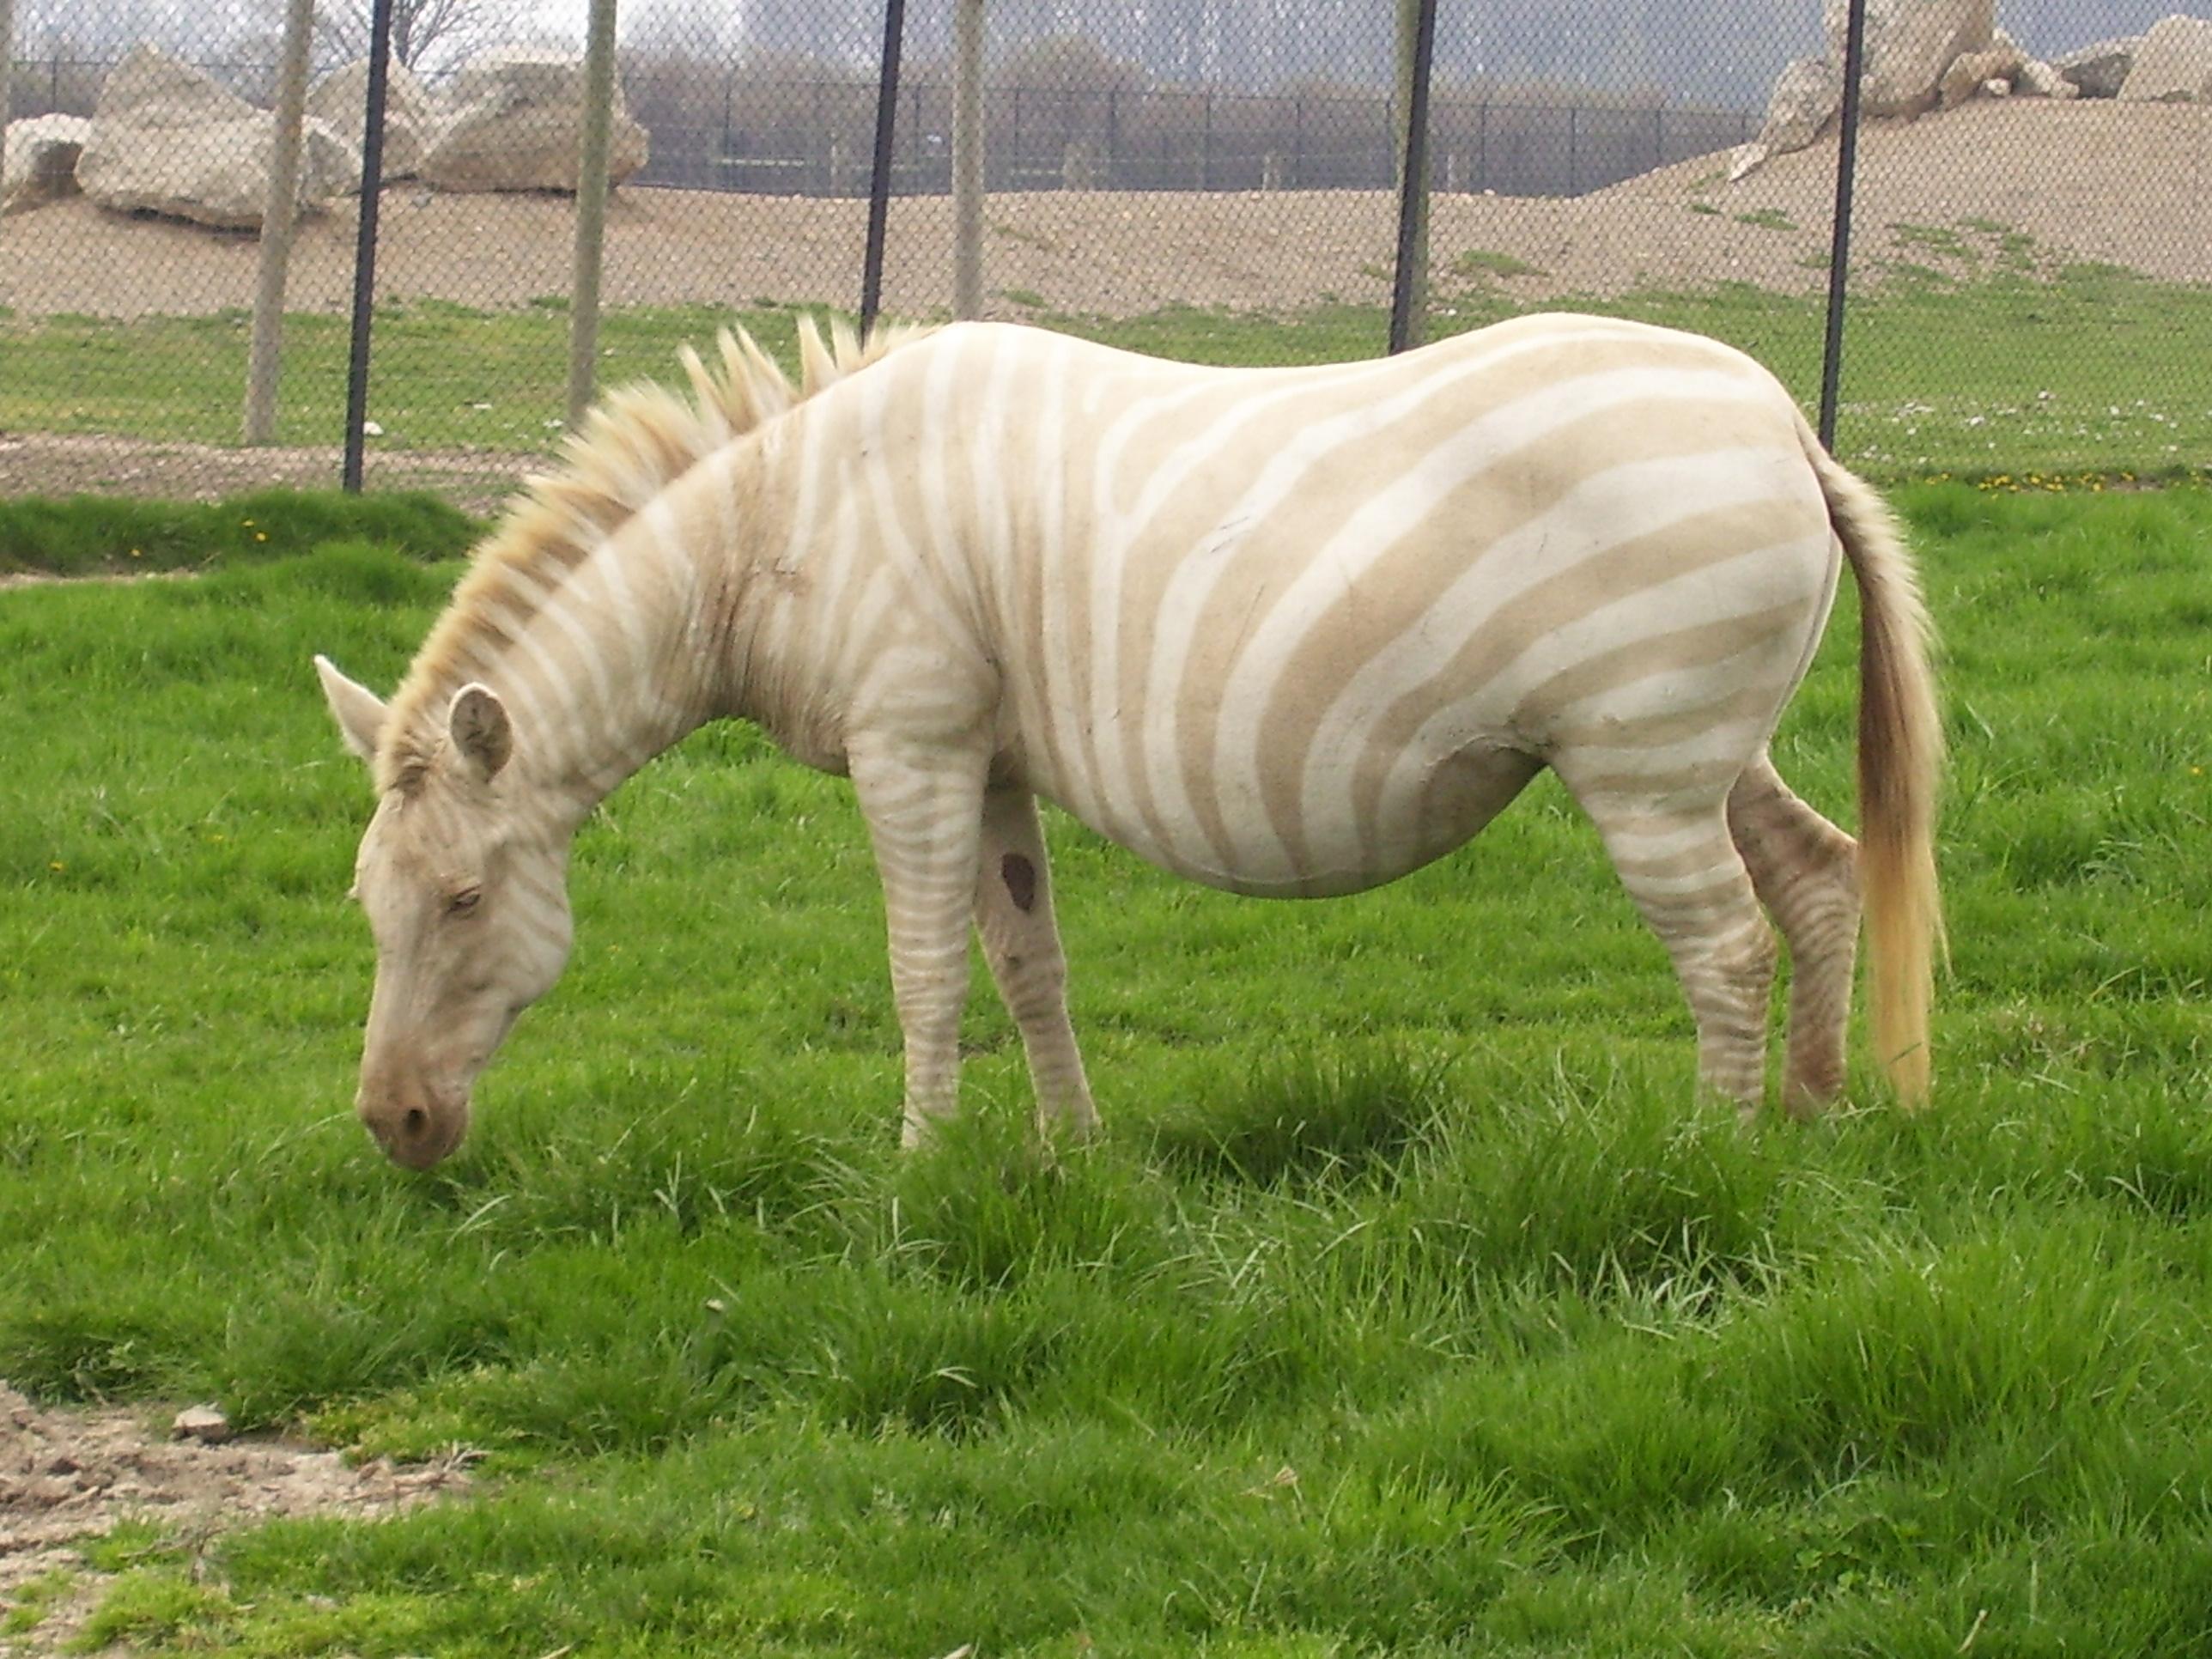 Zebra Without Stripes A zebra without it s stripes